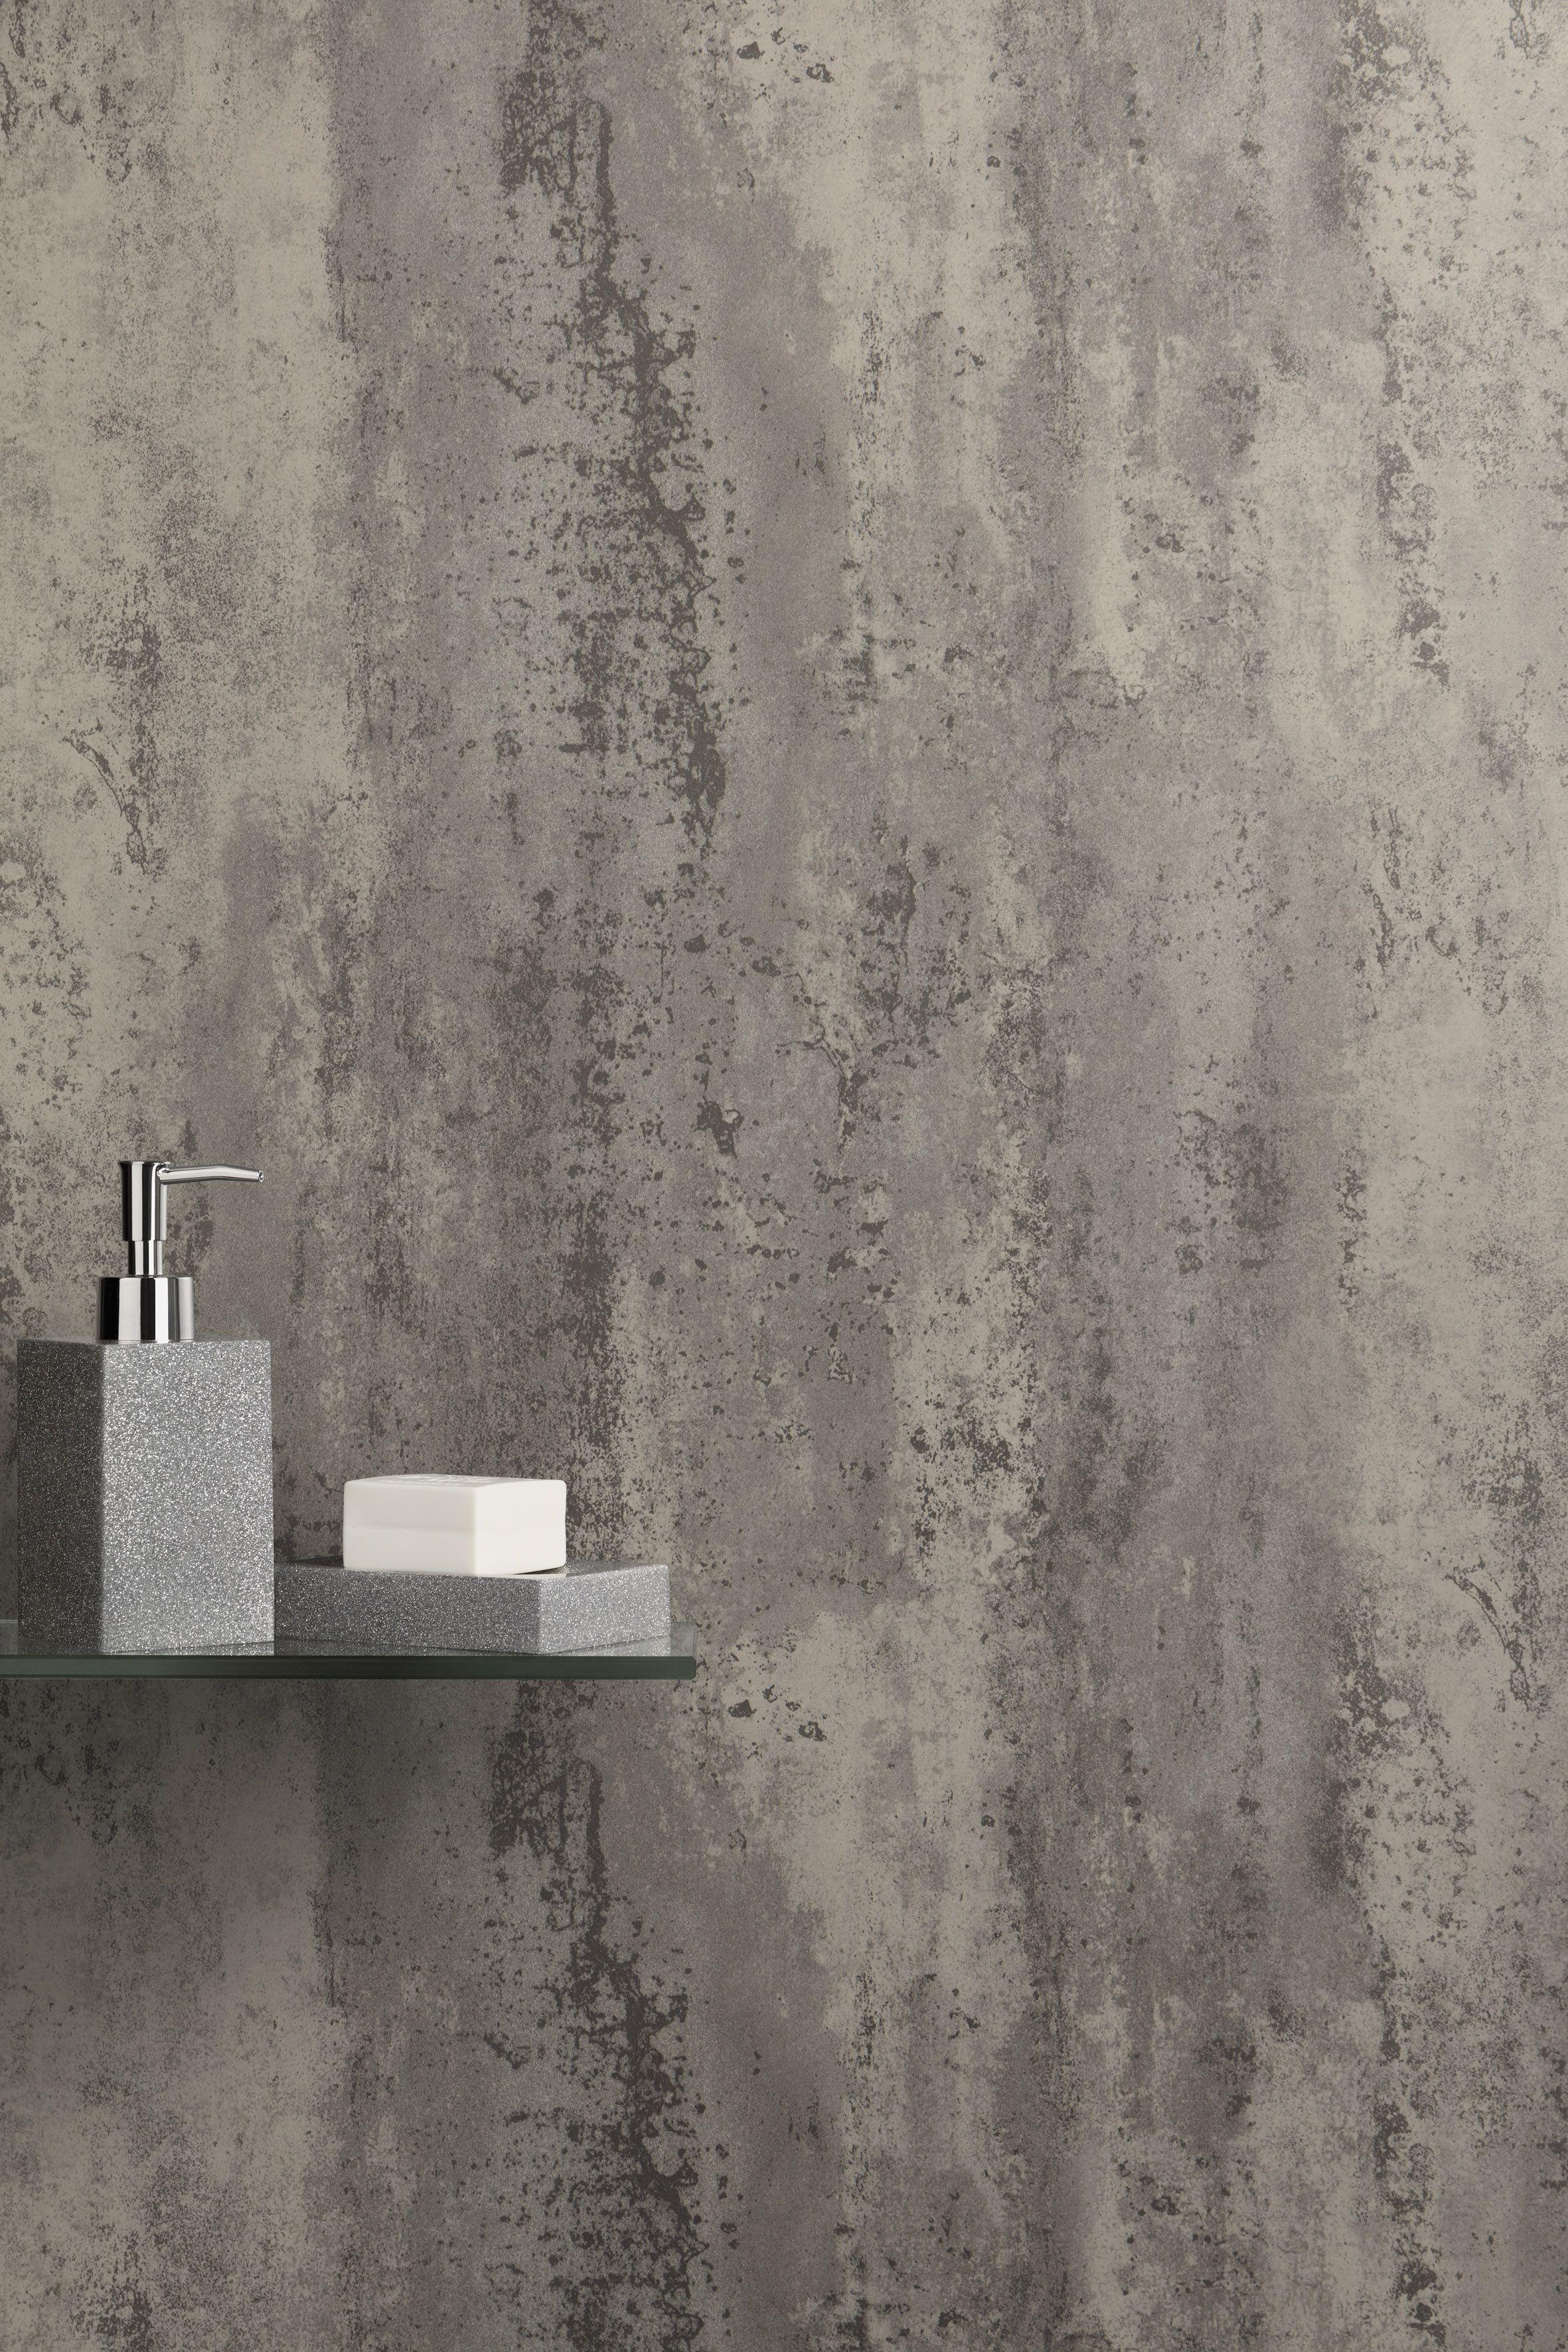 ancona grey retro metallic pvc shower wall panel